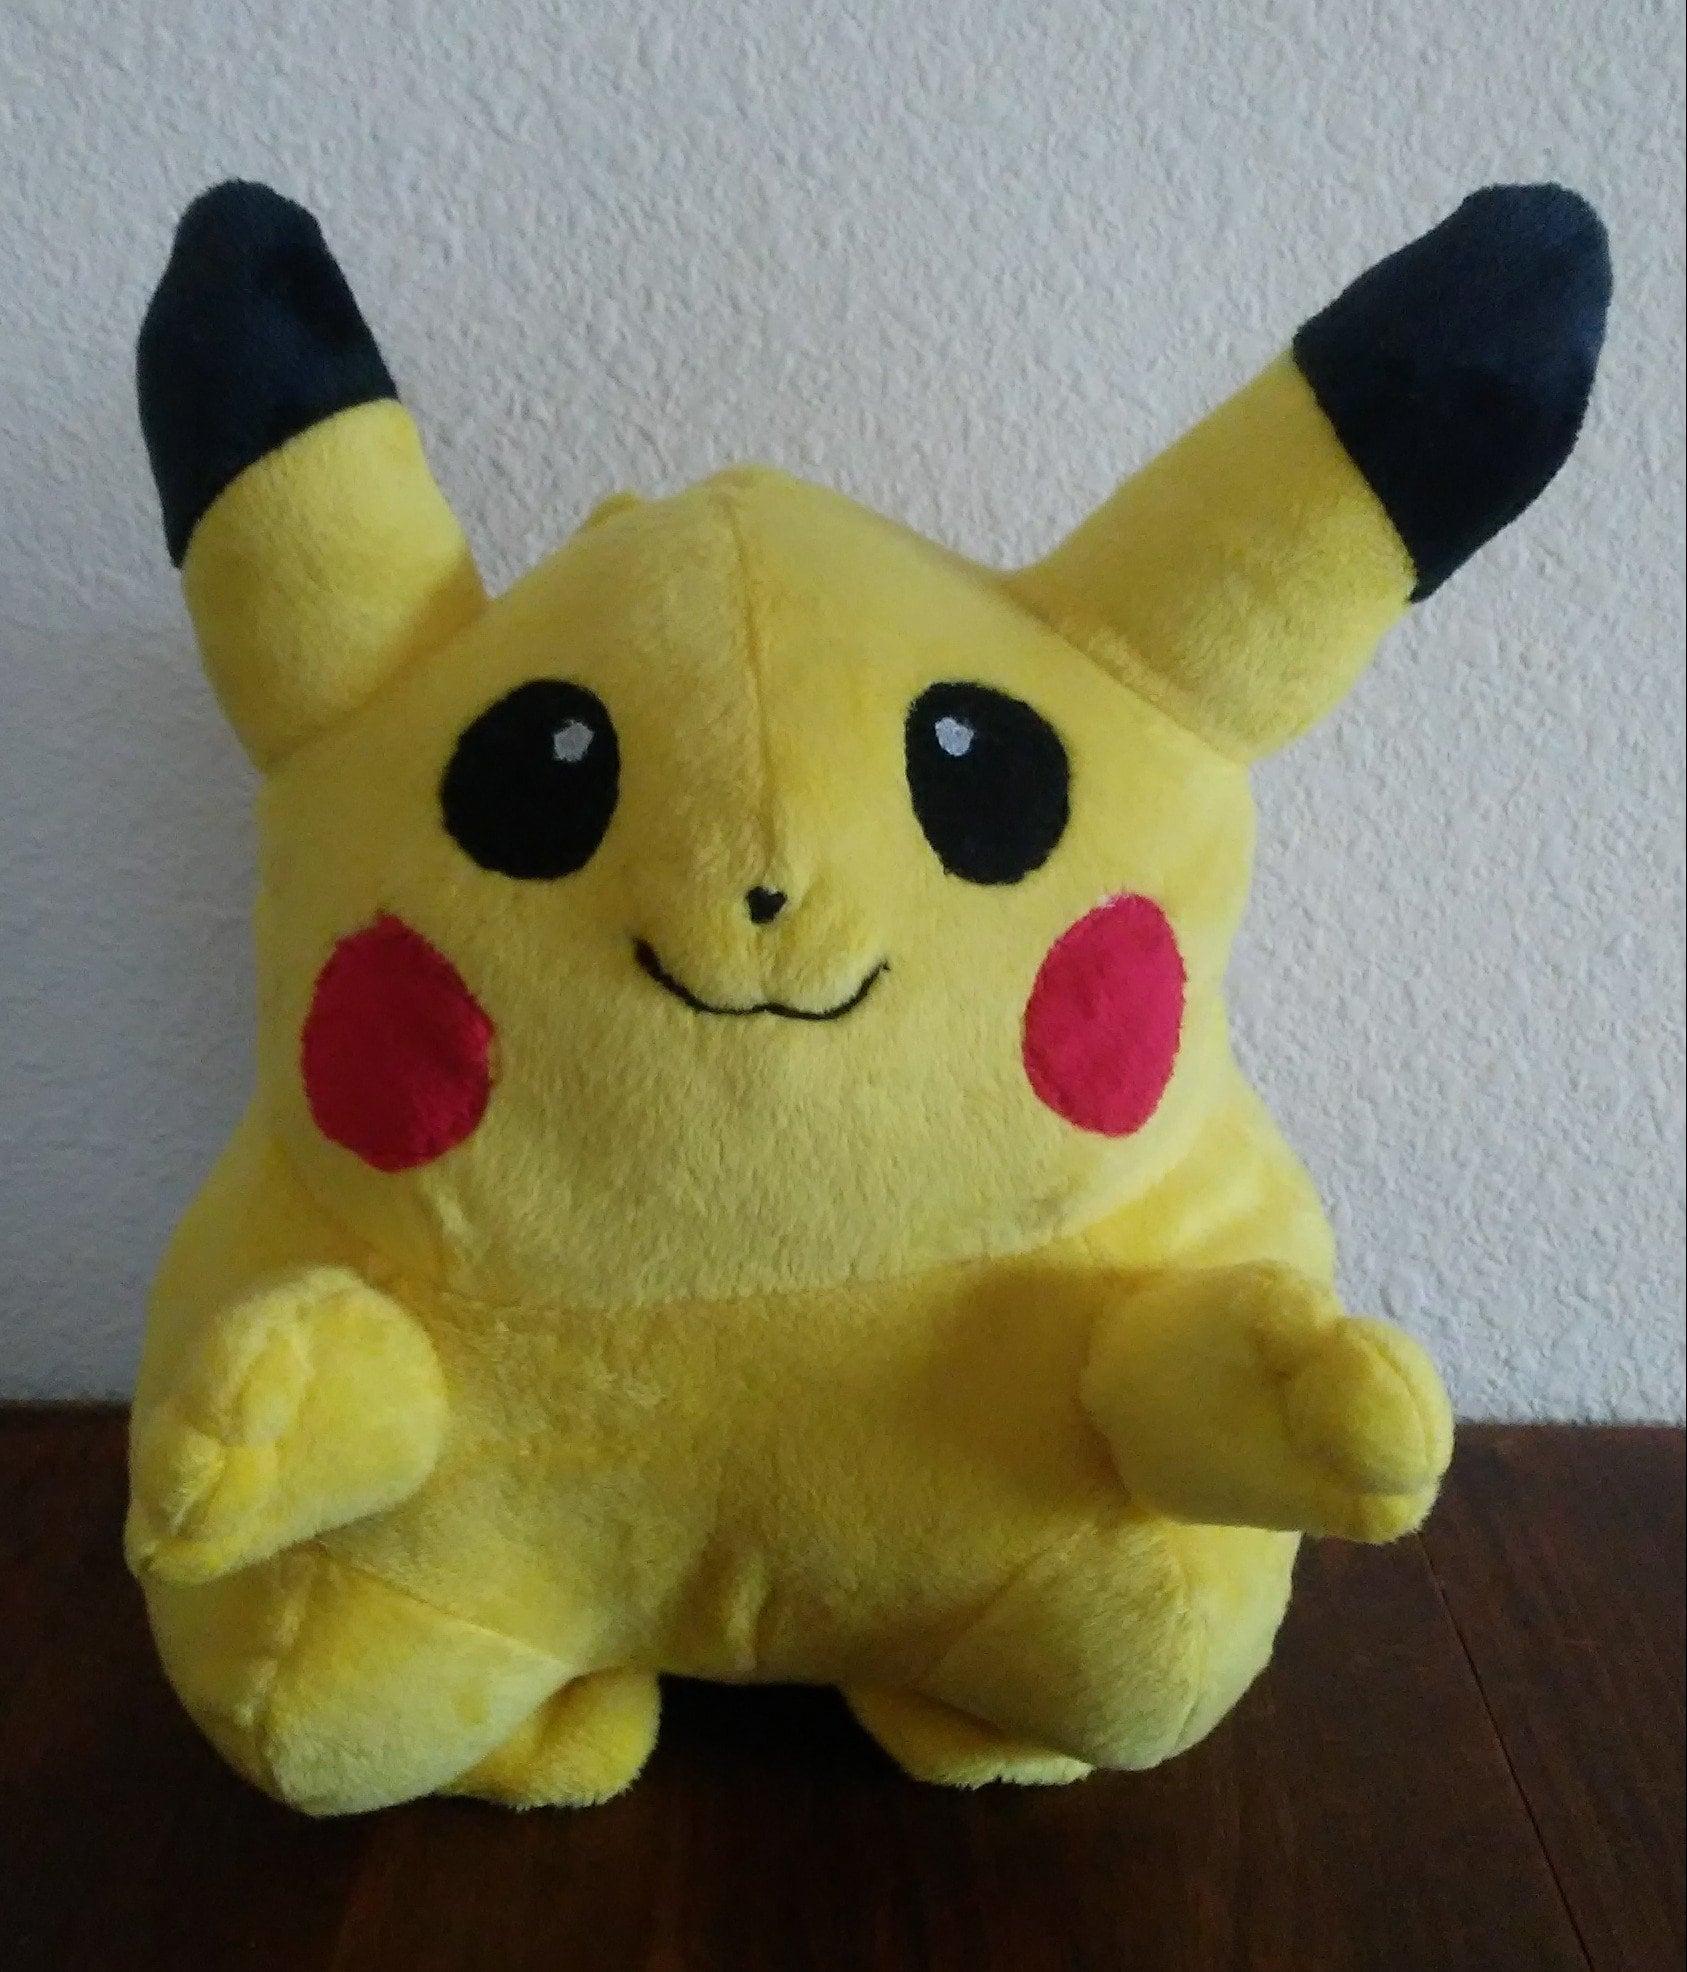 cute cuddly classic pikachu plush handmade soft adorable